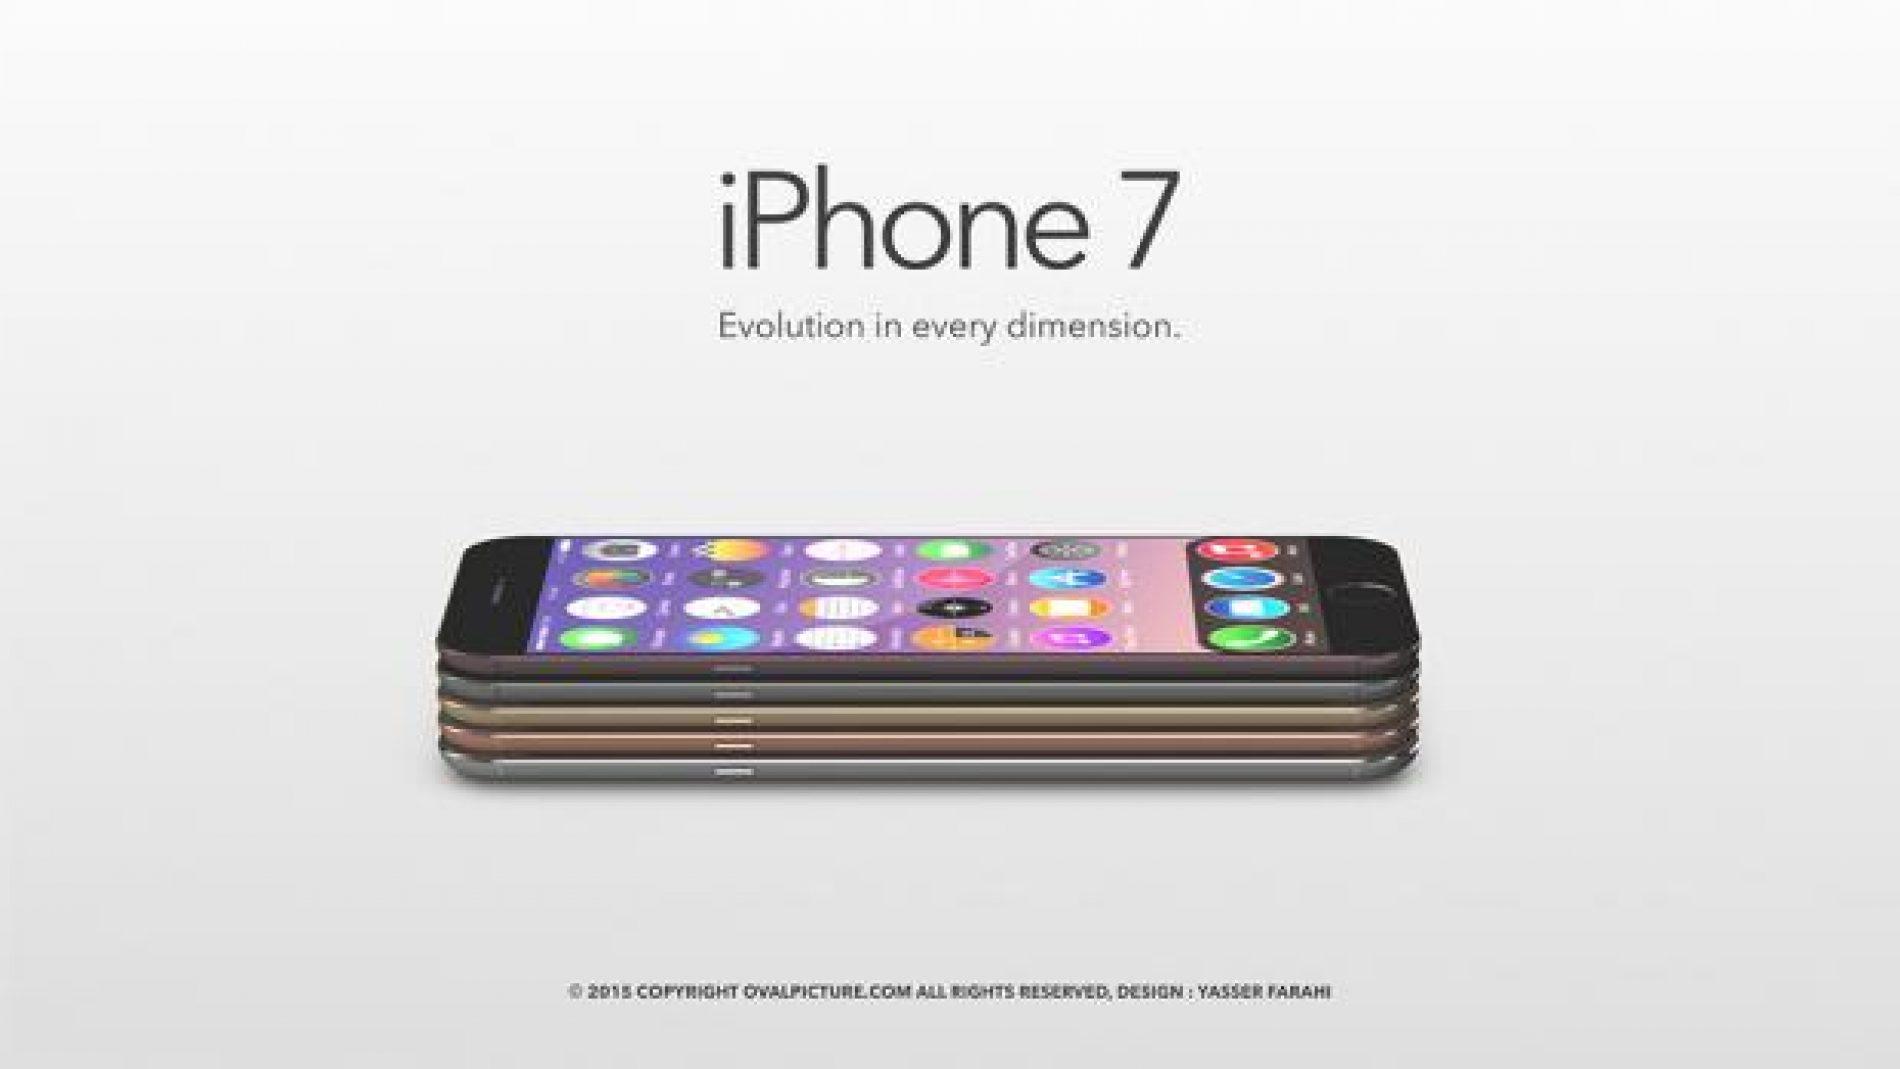 iPhone 7 sjell memorien me 256GB?